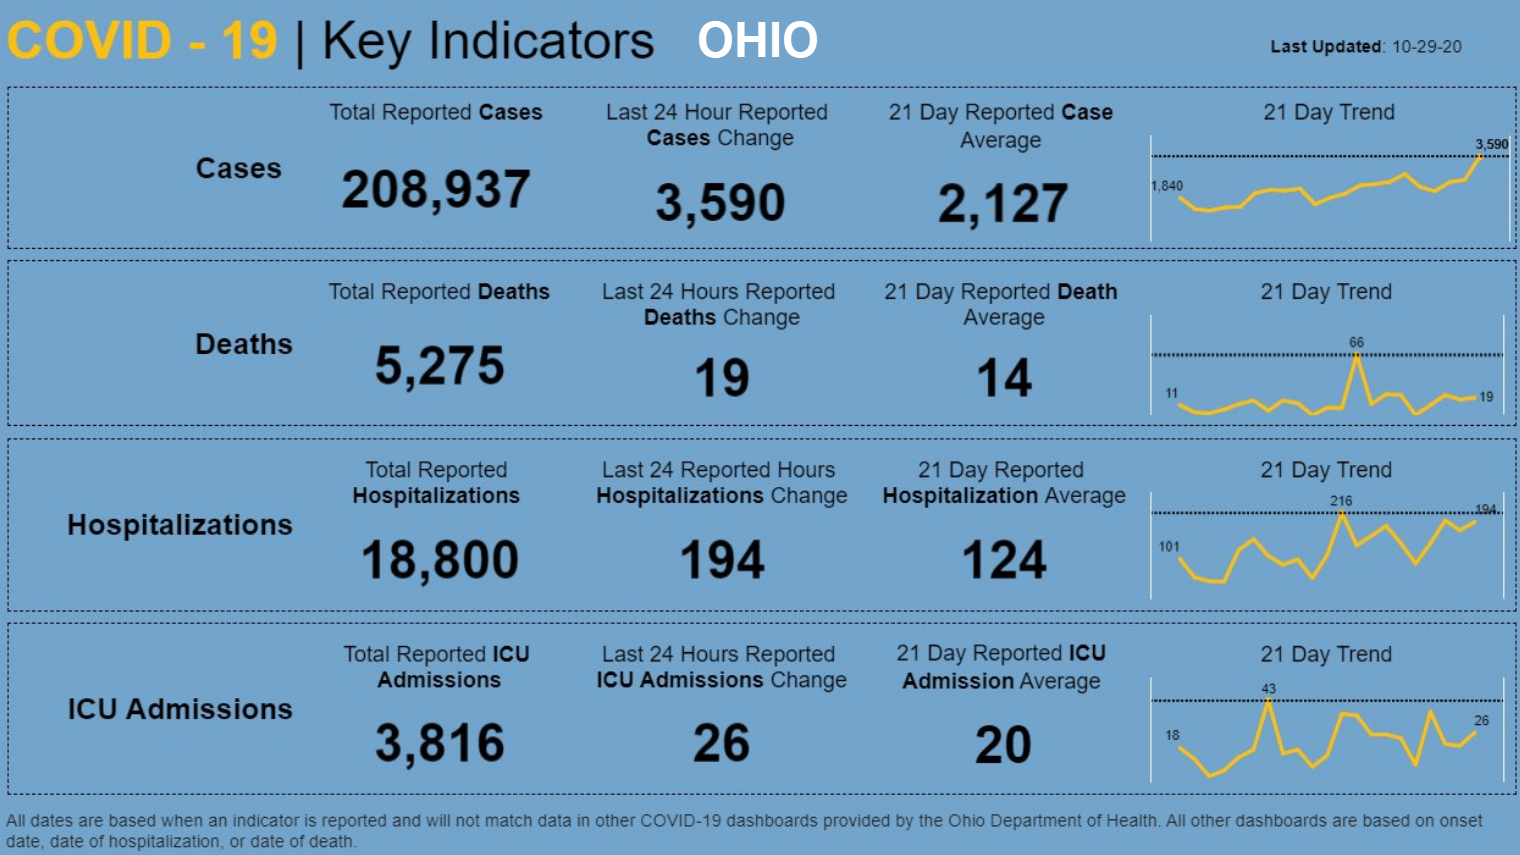 covid 19 key indicators ohio